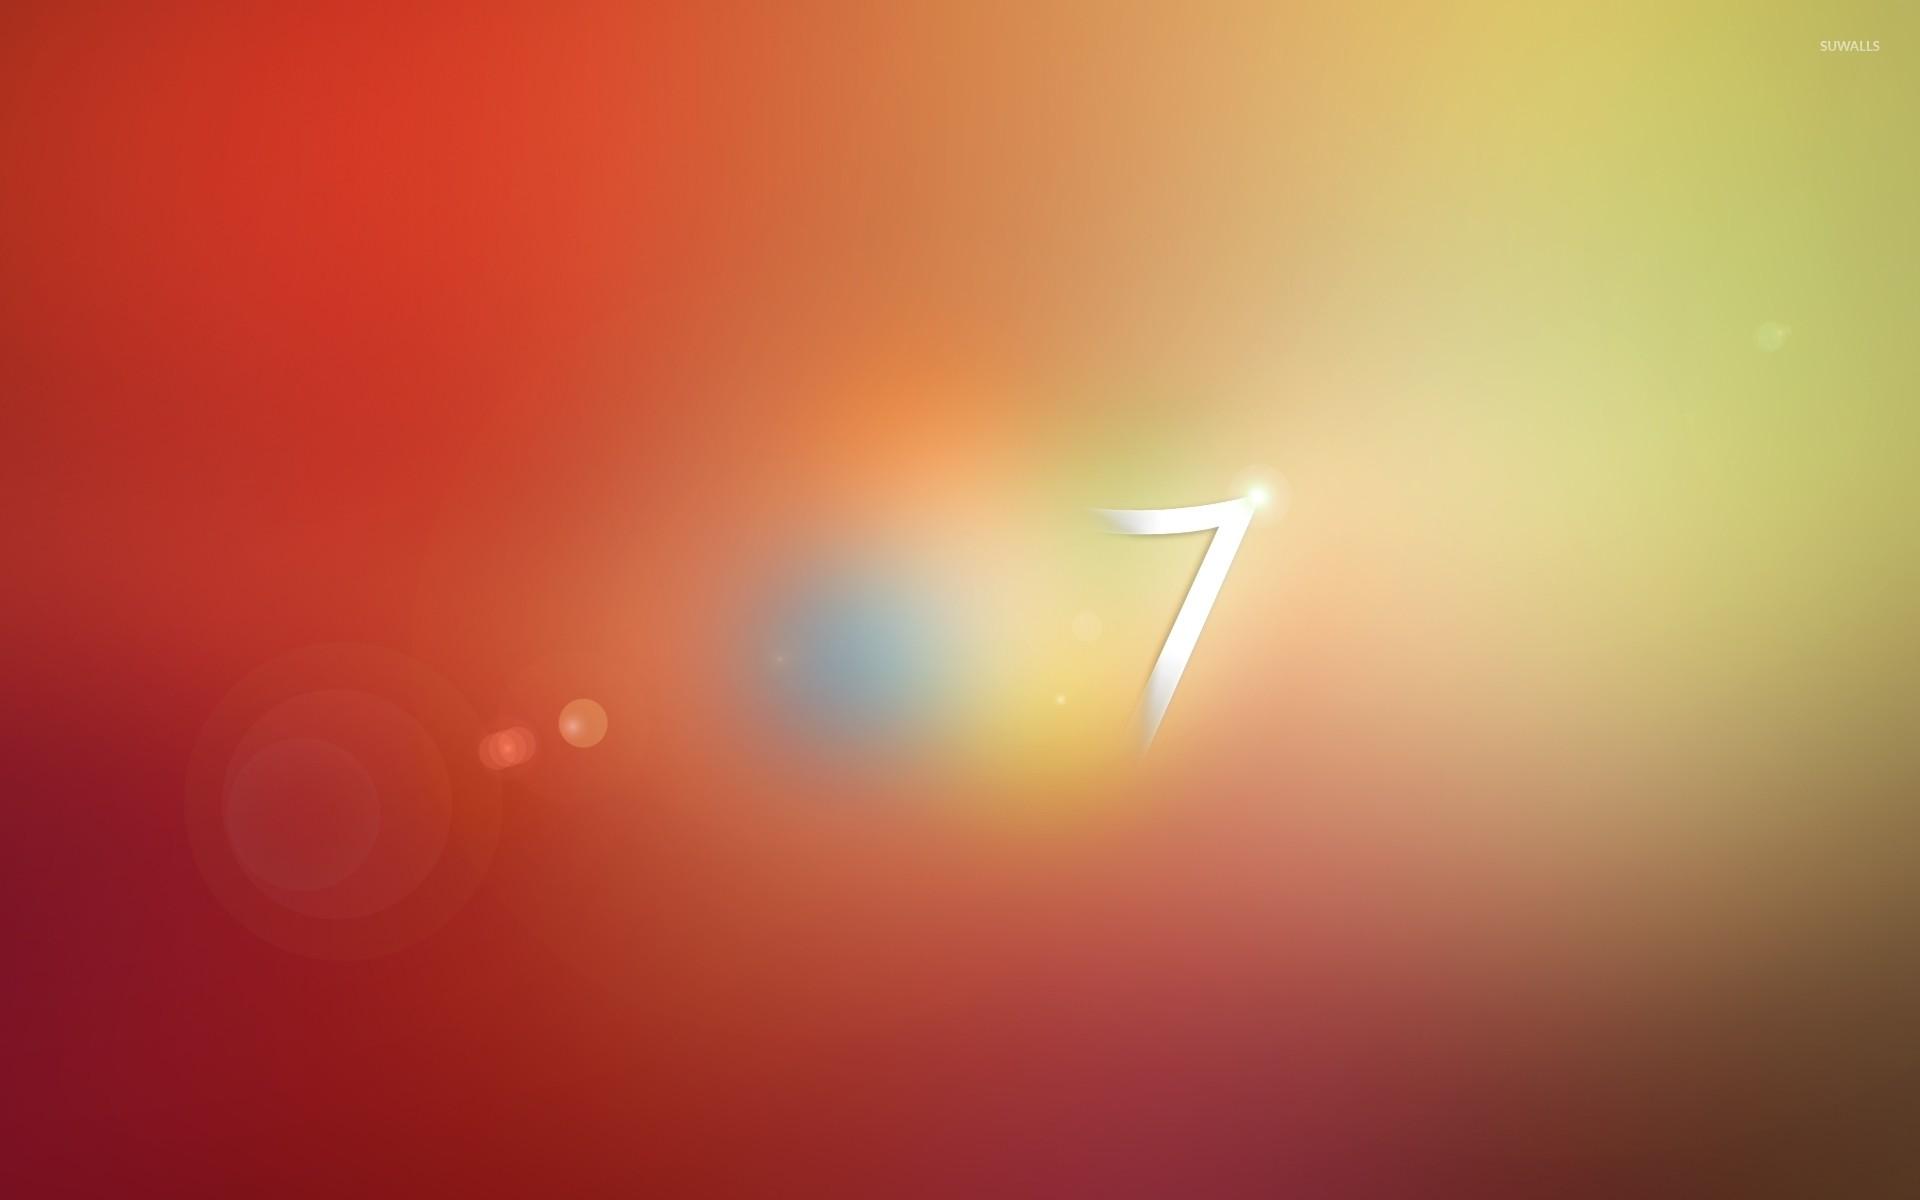 Windows 7 [96] wallpaper jpg